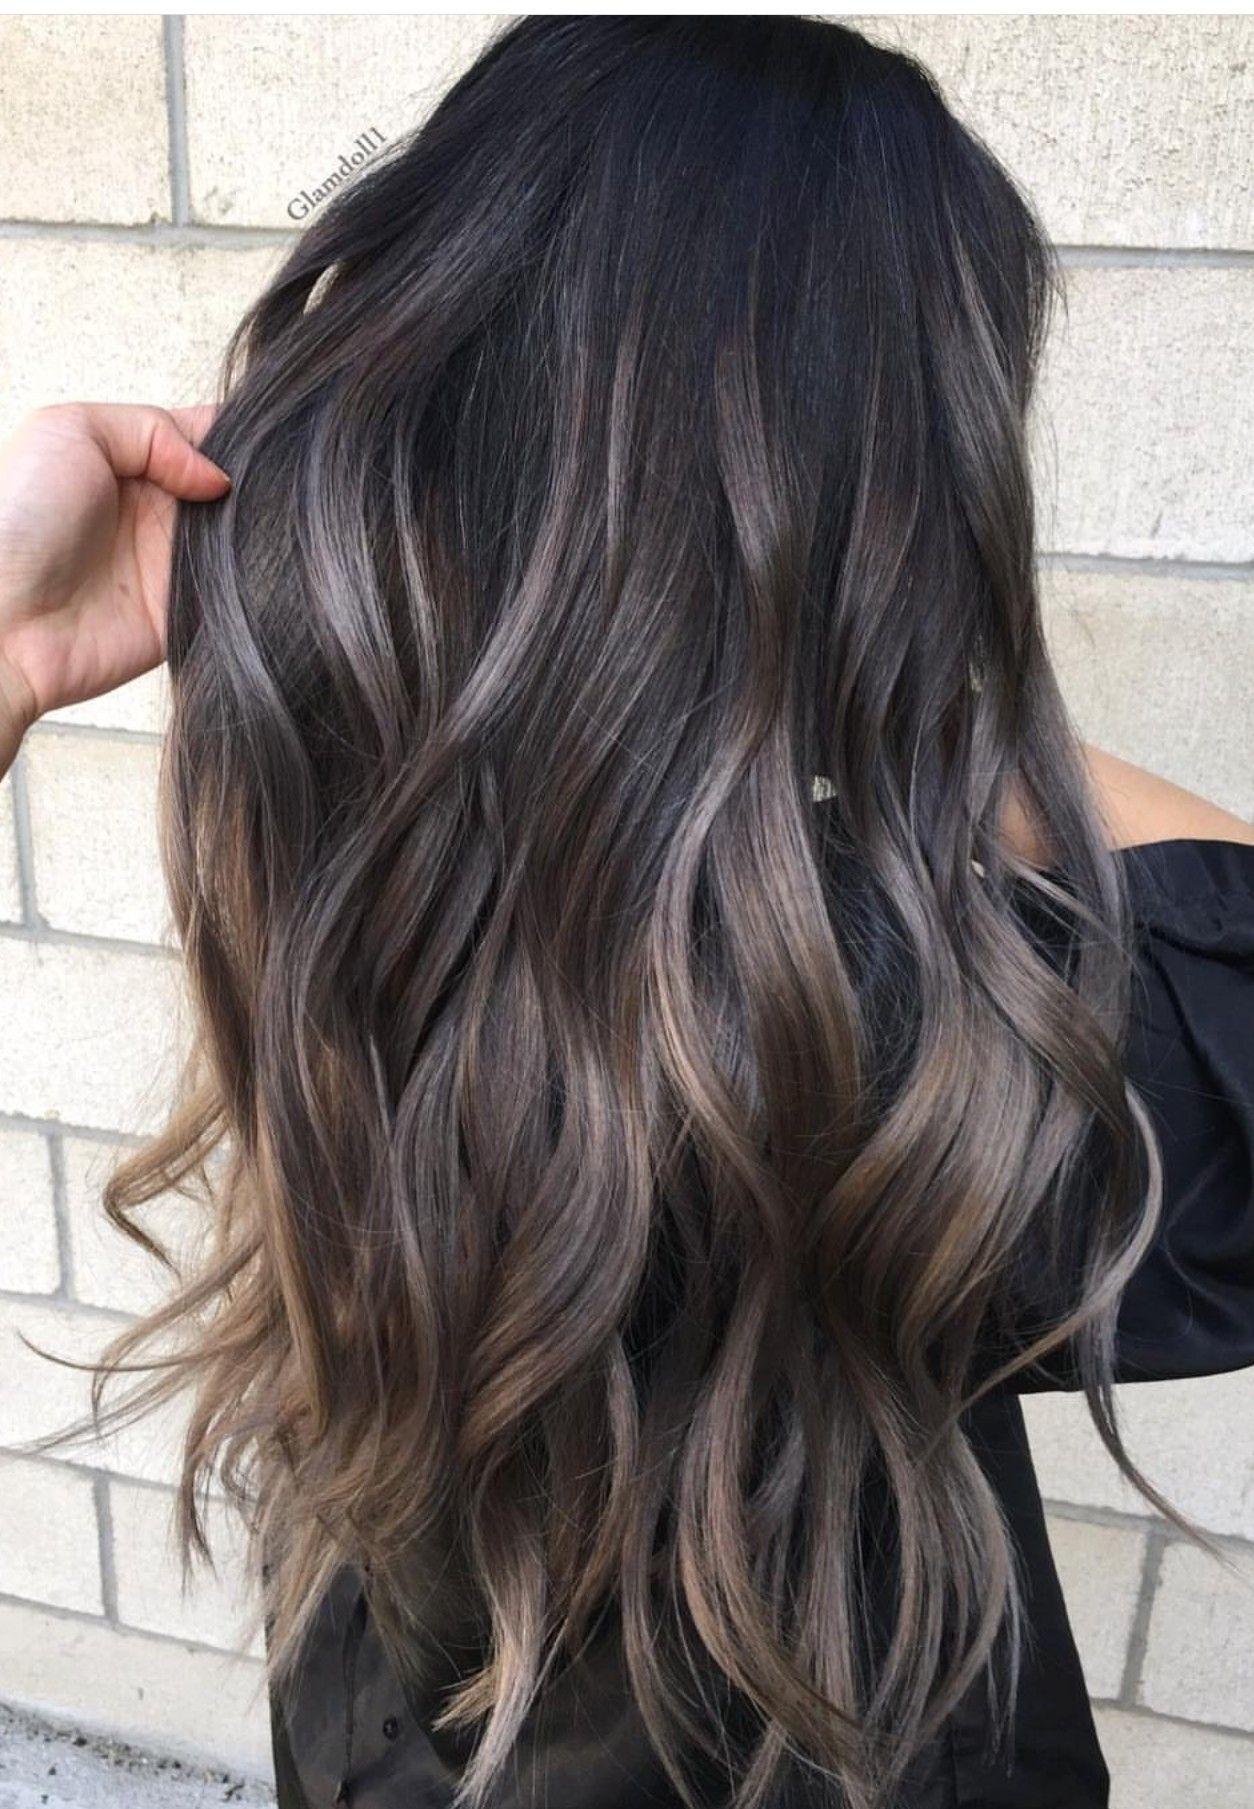 Pin By Victoria Cascio On Favorites In Hair Charcoal Hair Ash Blonde Hair Colour Cool Hair Color